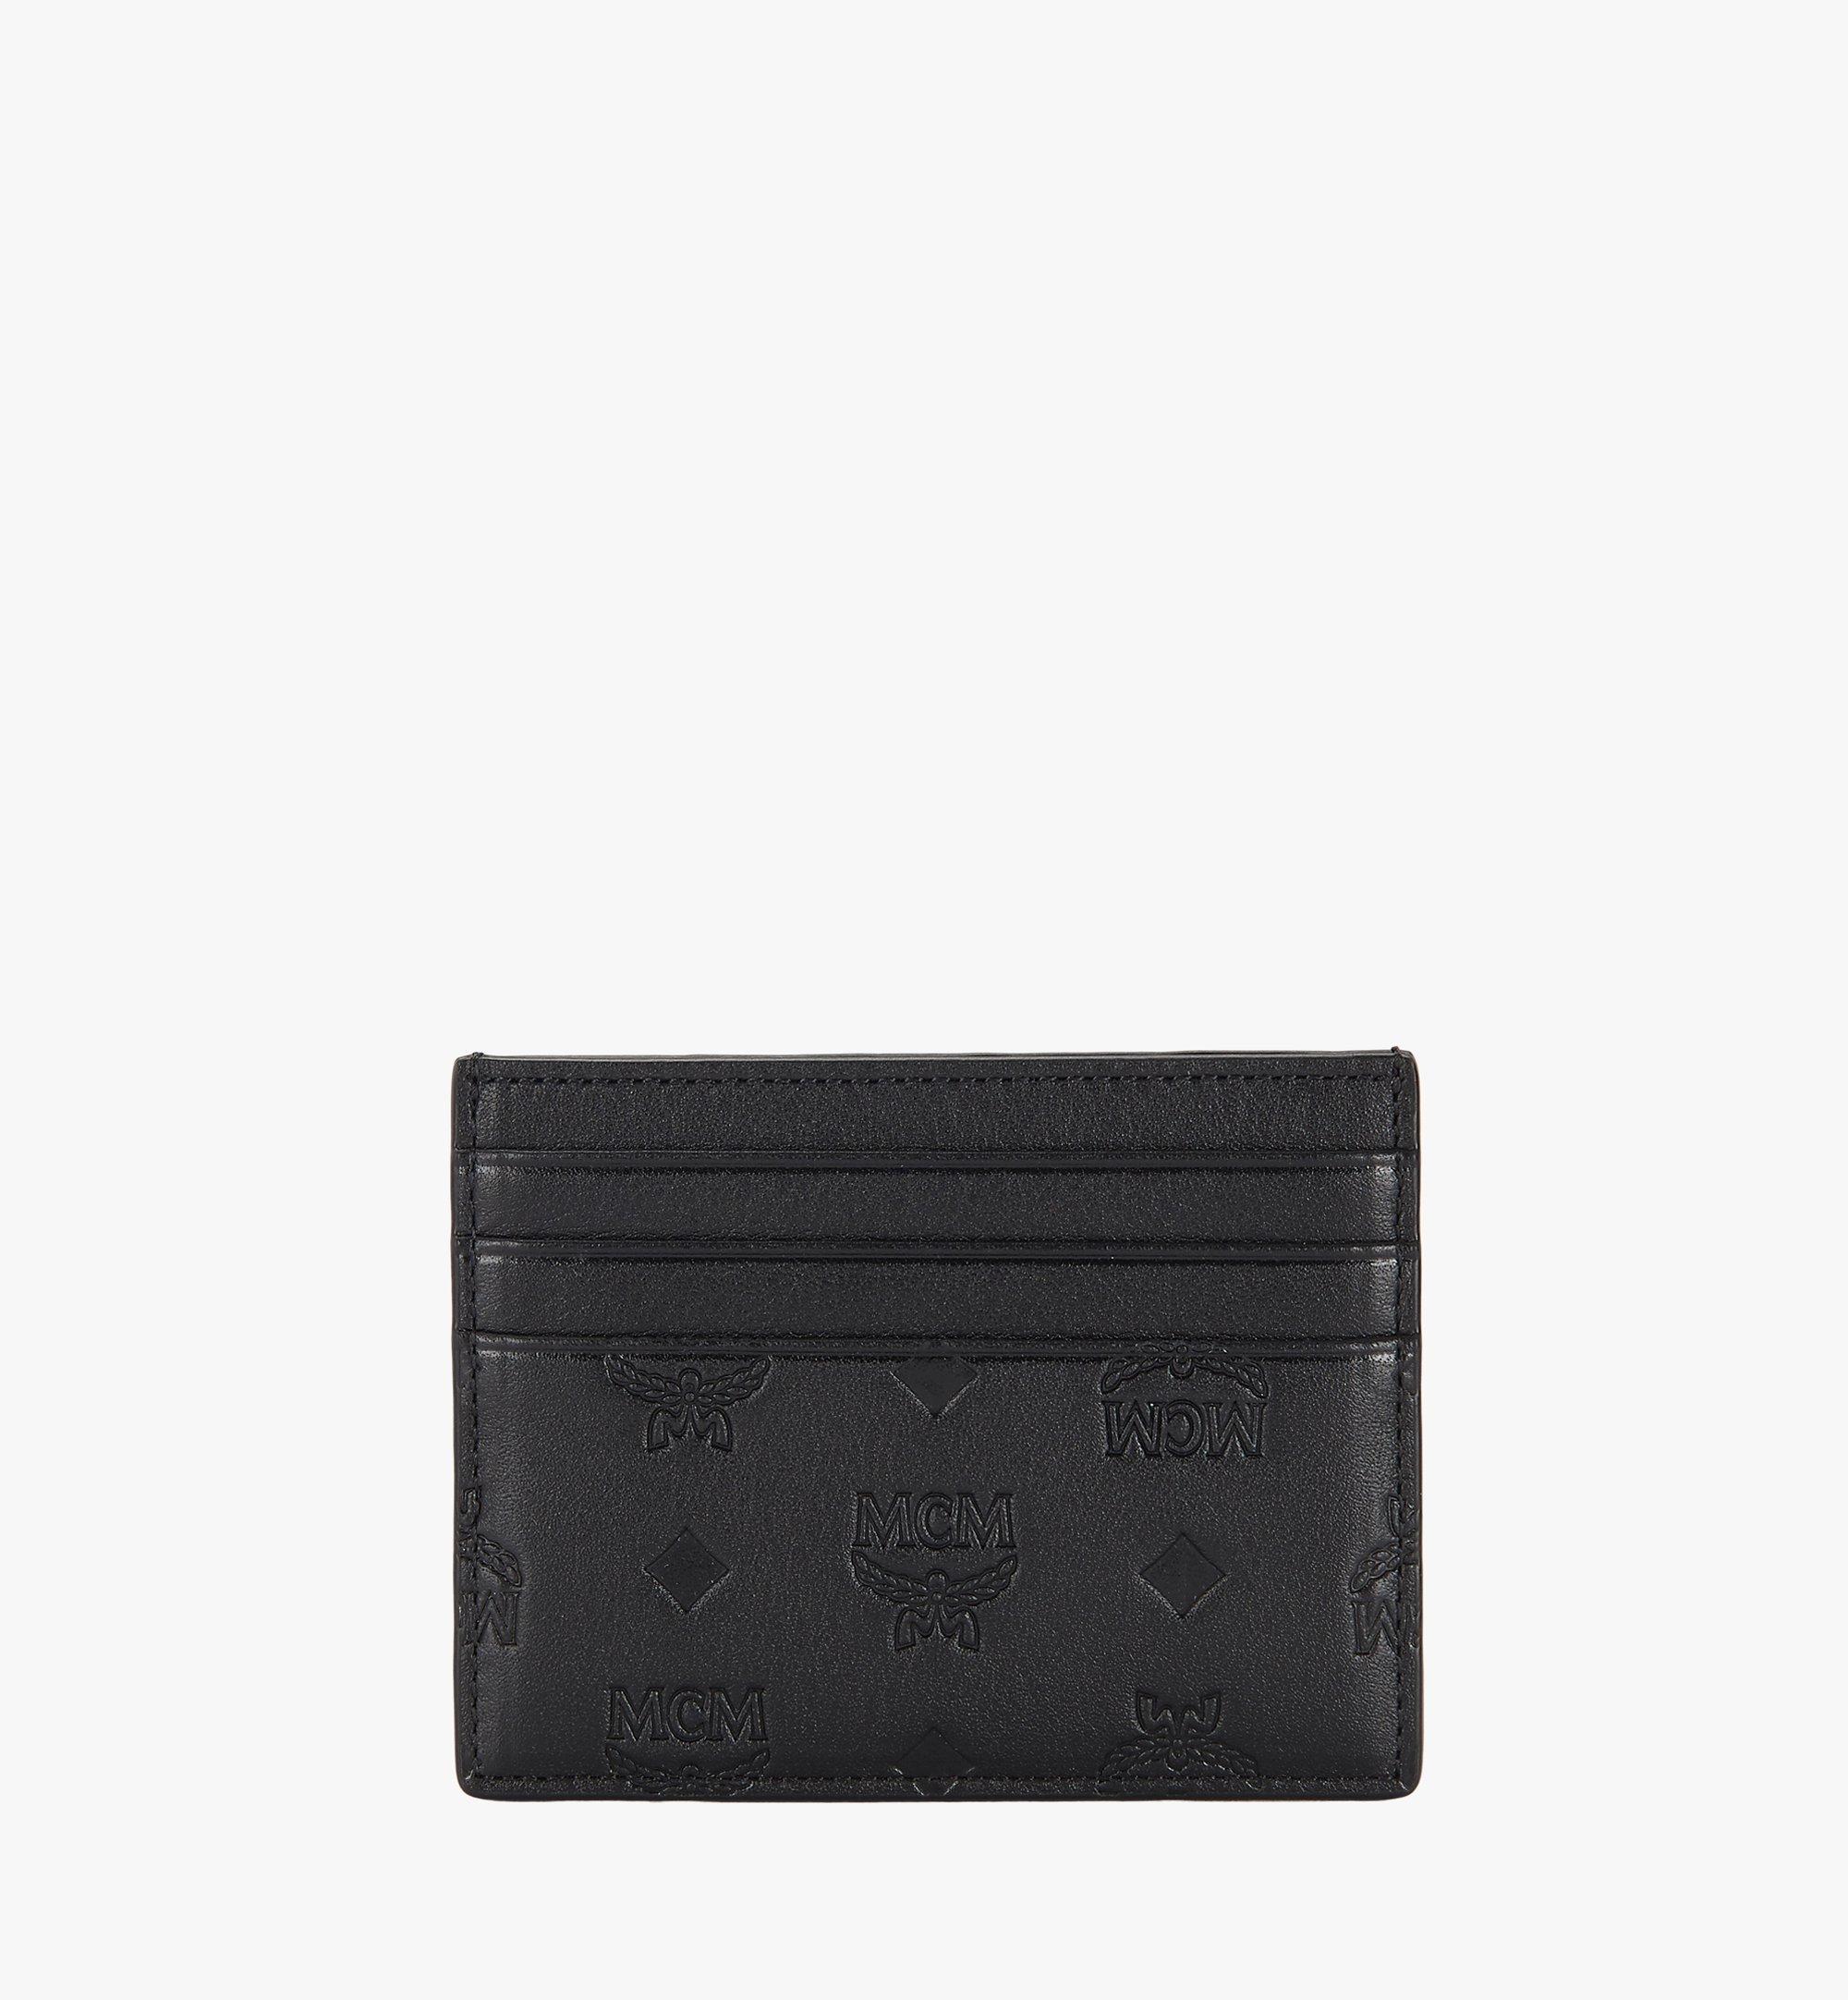 MCM Money Clip Card Case in Monogram Leather Black MXC9AKL15BK001 Alternate View 2